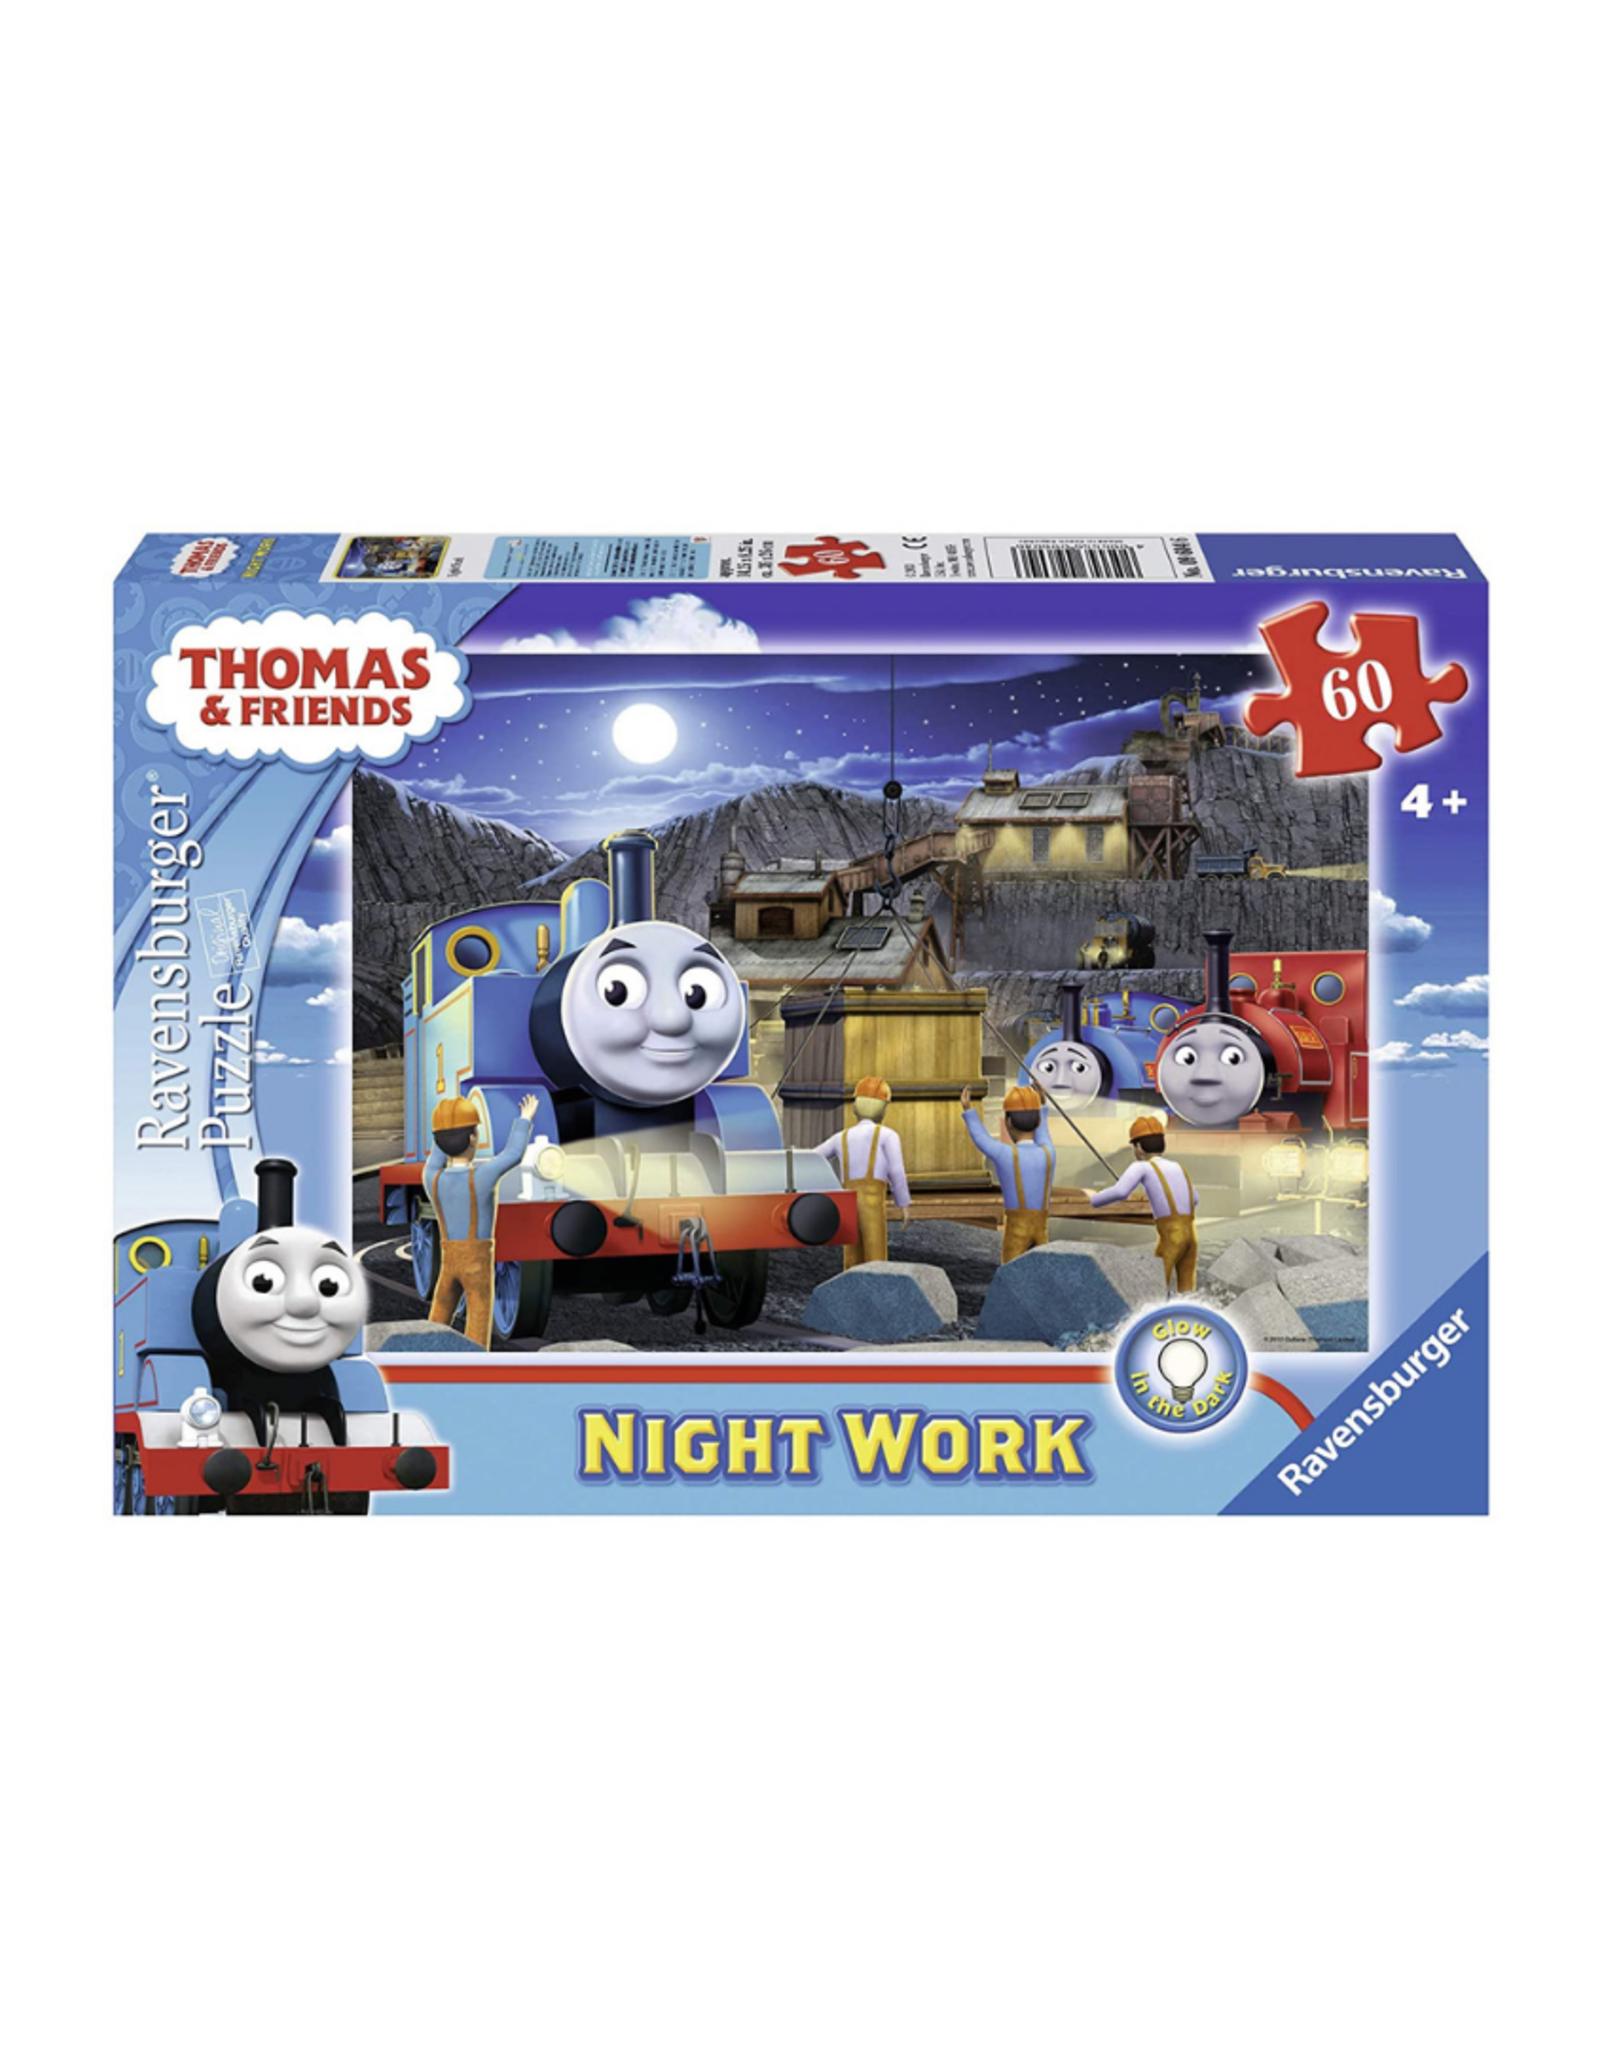 Ravensburger Night Work 60pc Glow in Dark Puzzle